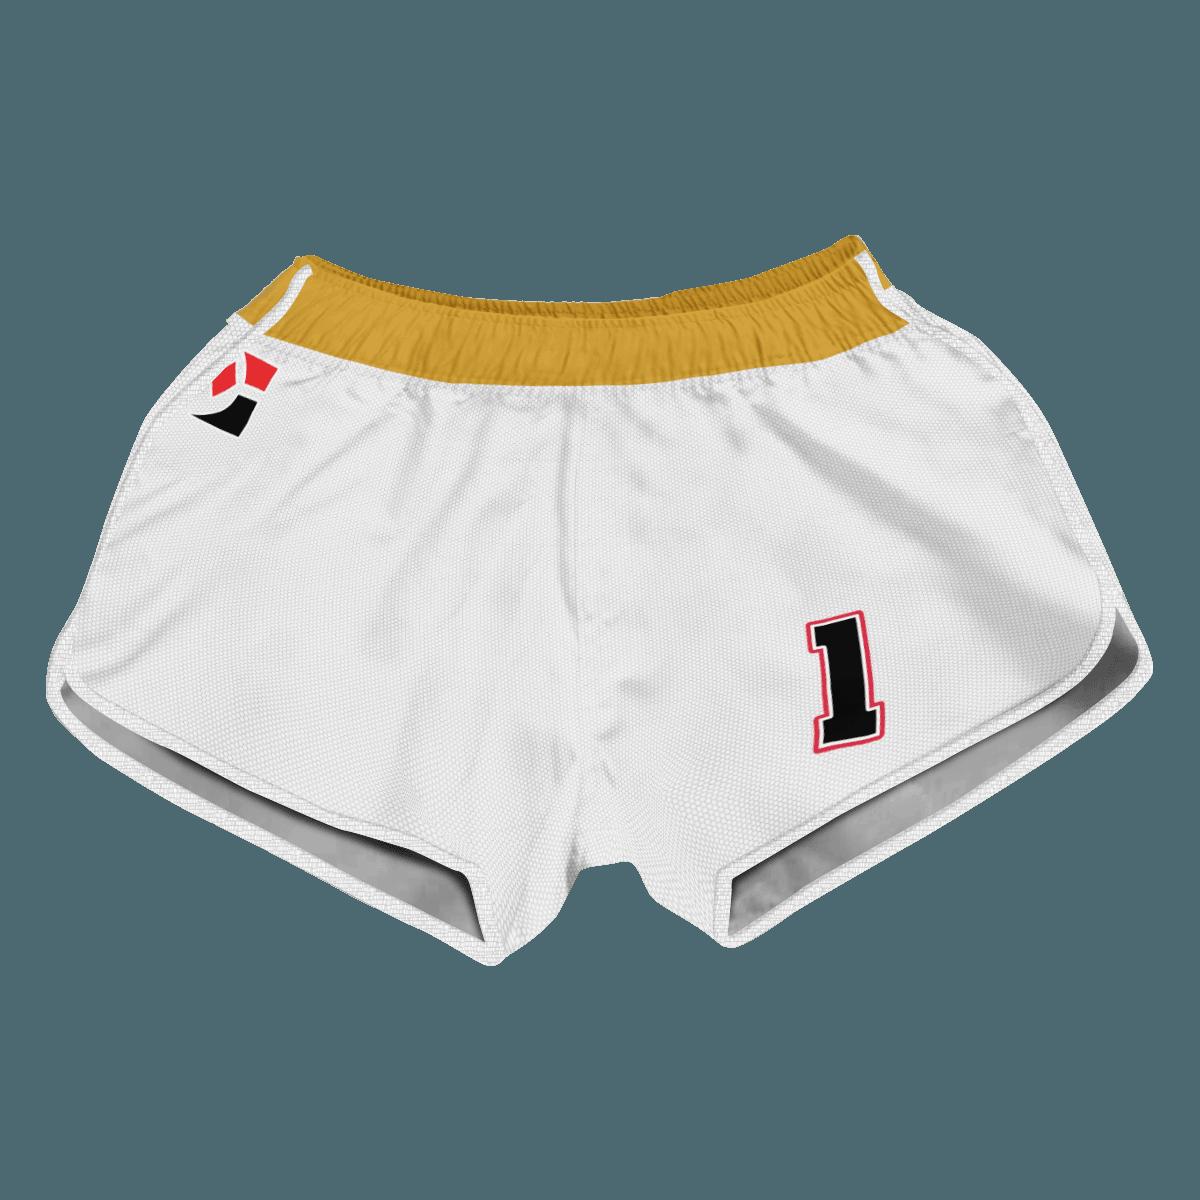 Pokemon Champion Uniform Women Beach Shorts FDM3107 XS Official Anime Swimsuit Merch